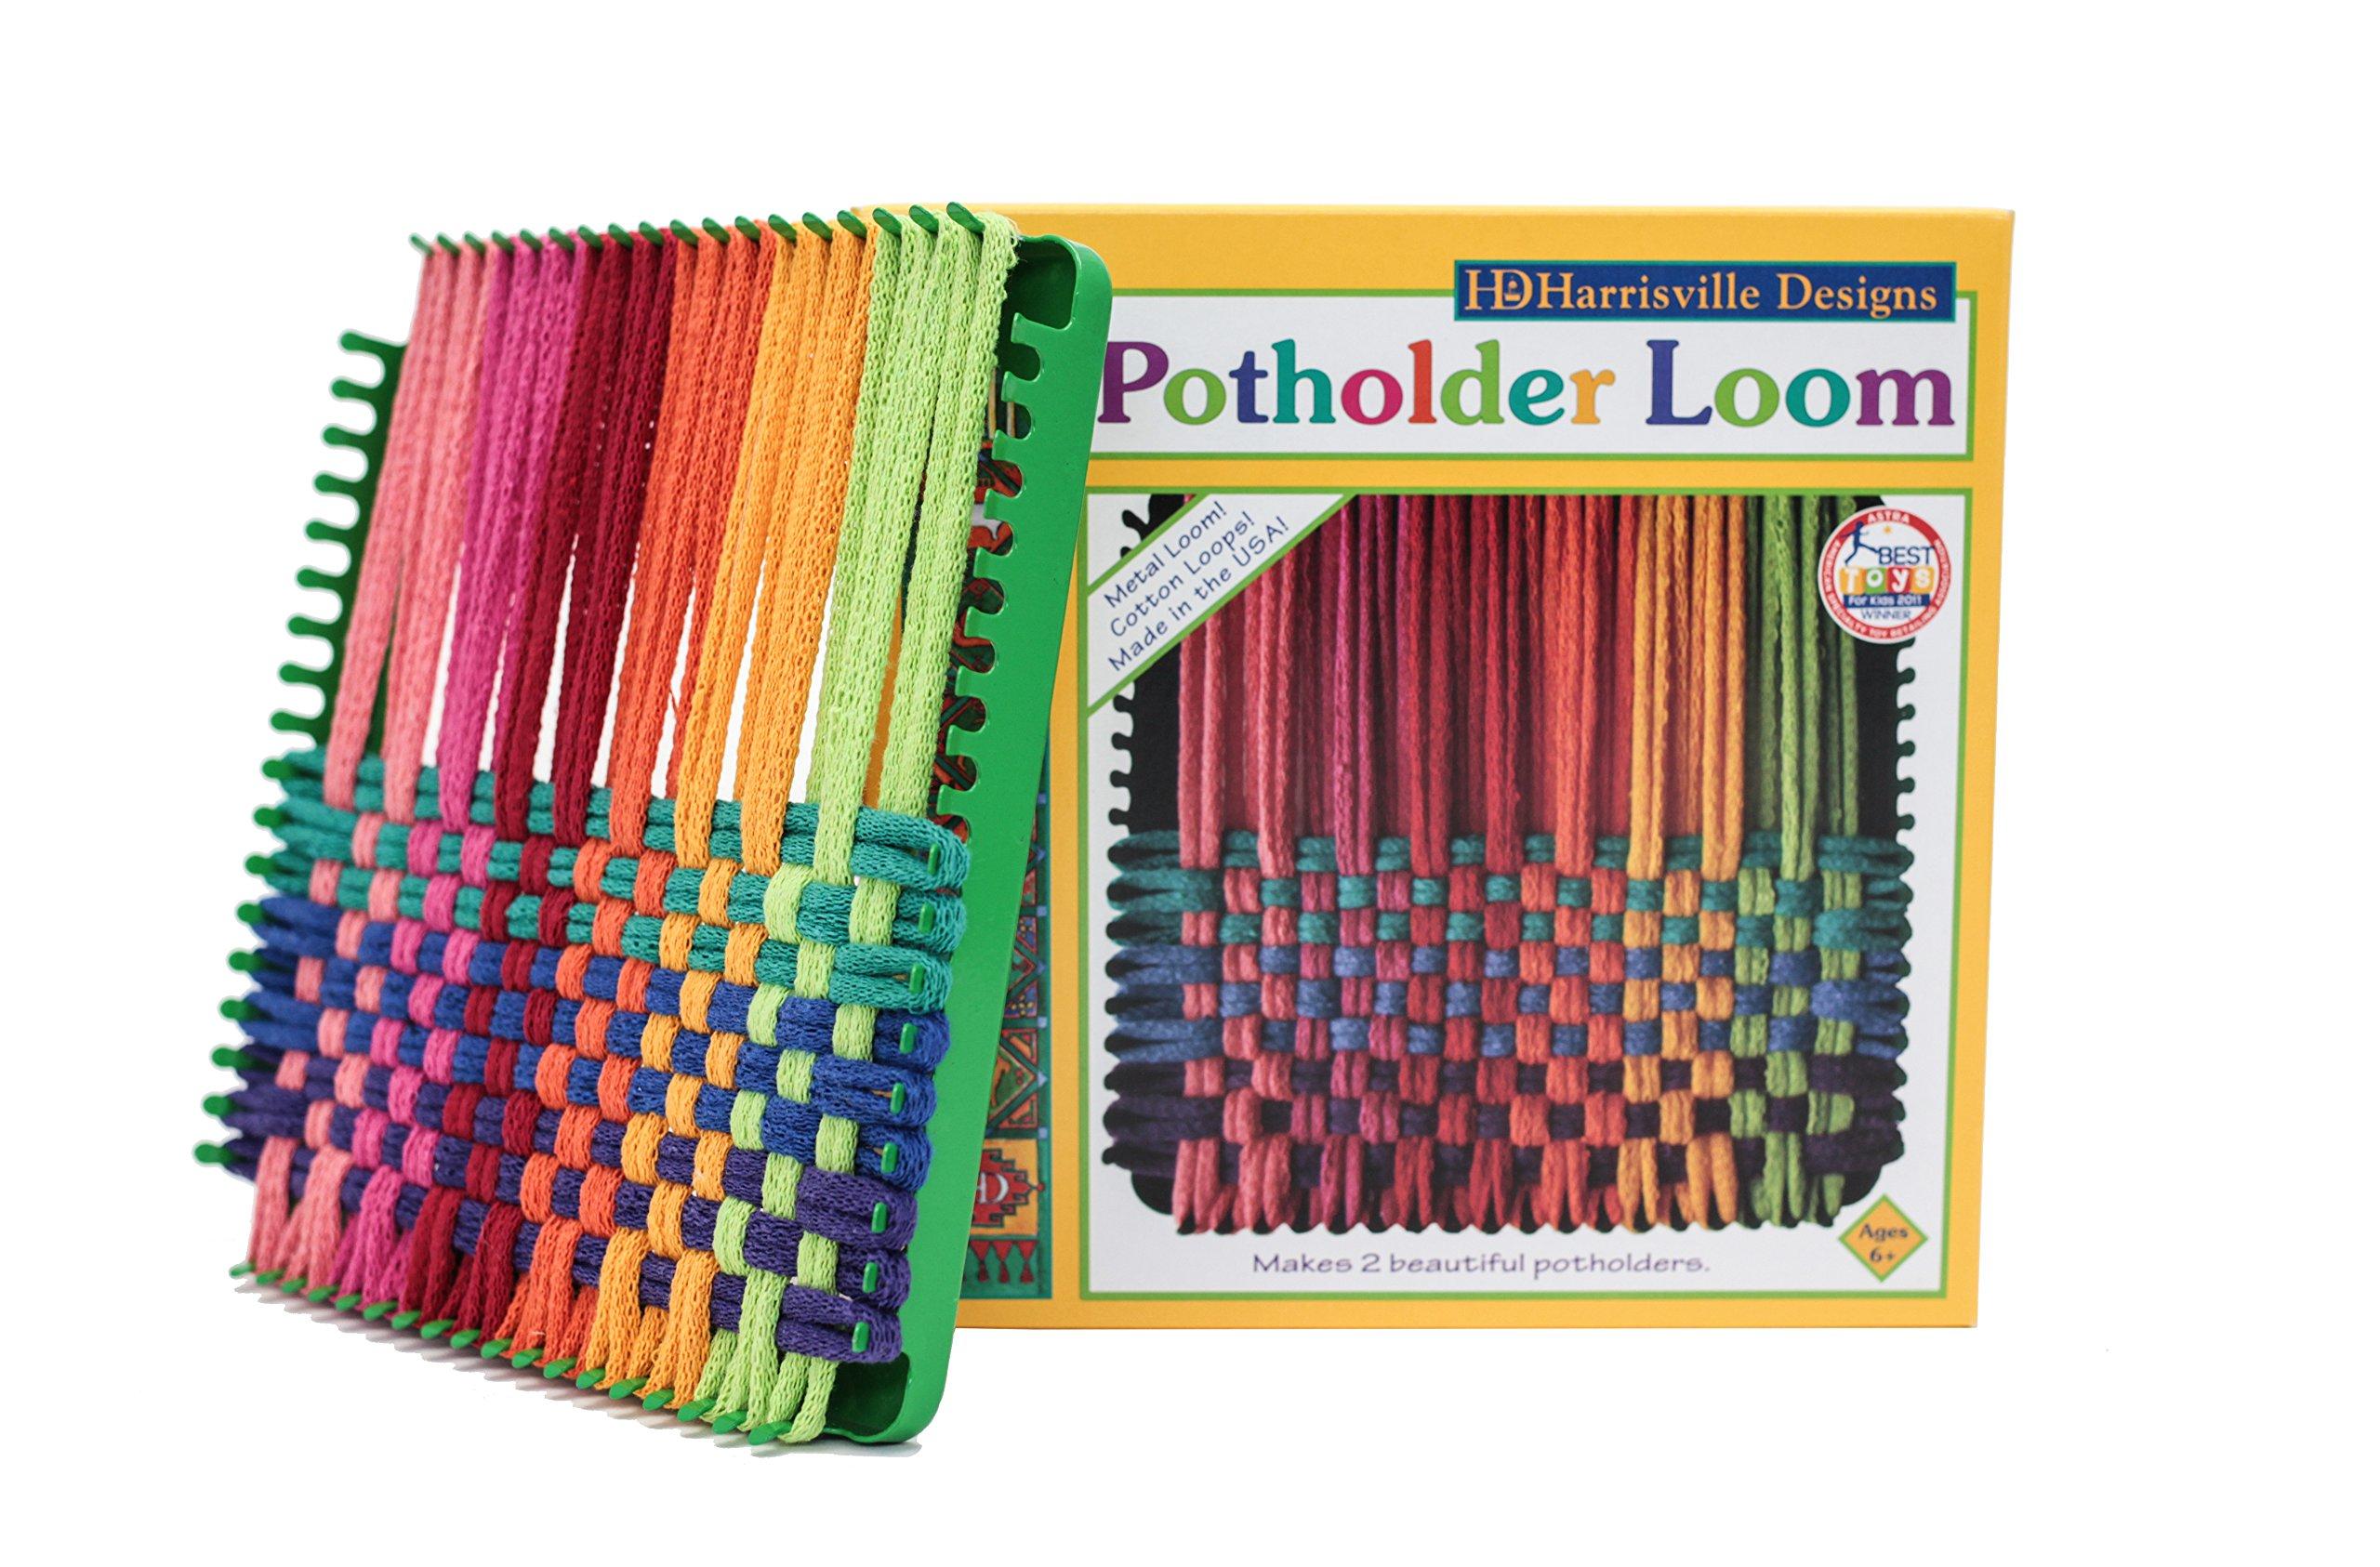 Harrisville Designs Traditional 7'' Potholder Loom Kit, Makes 2 Potholders